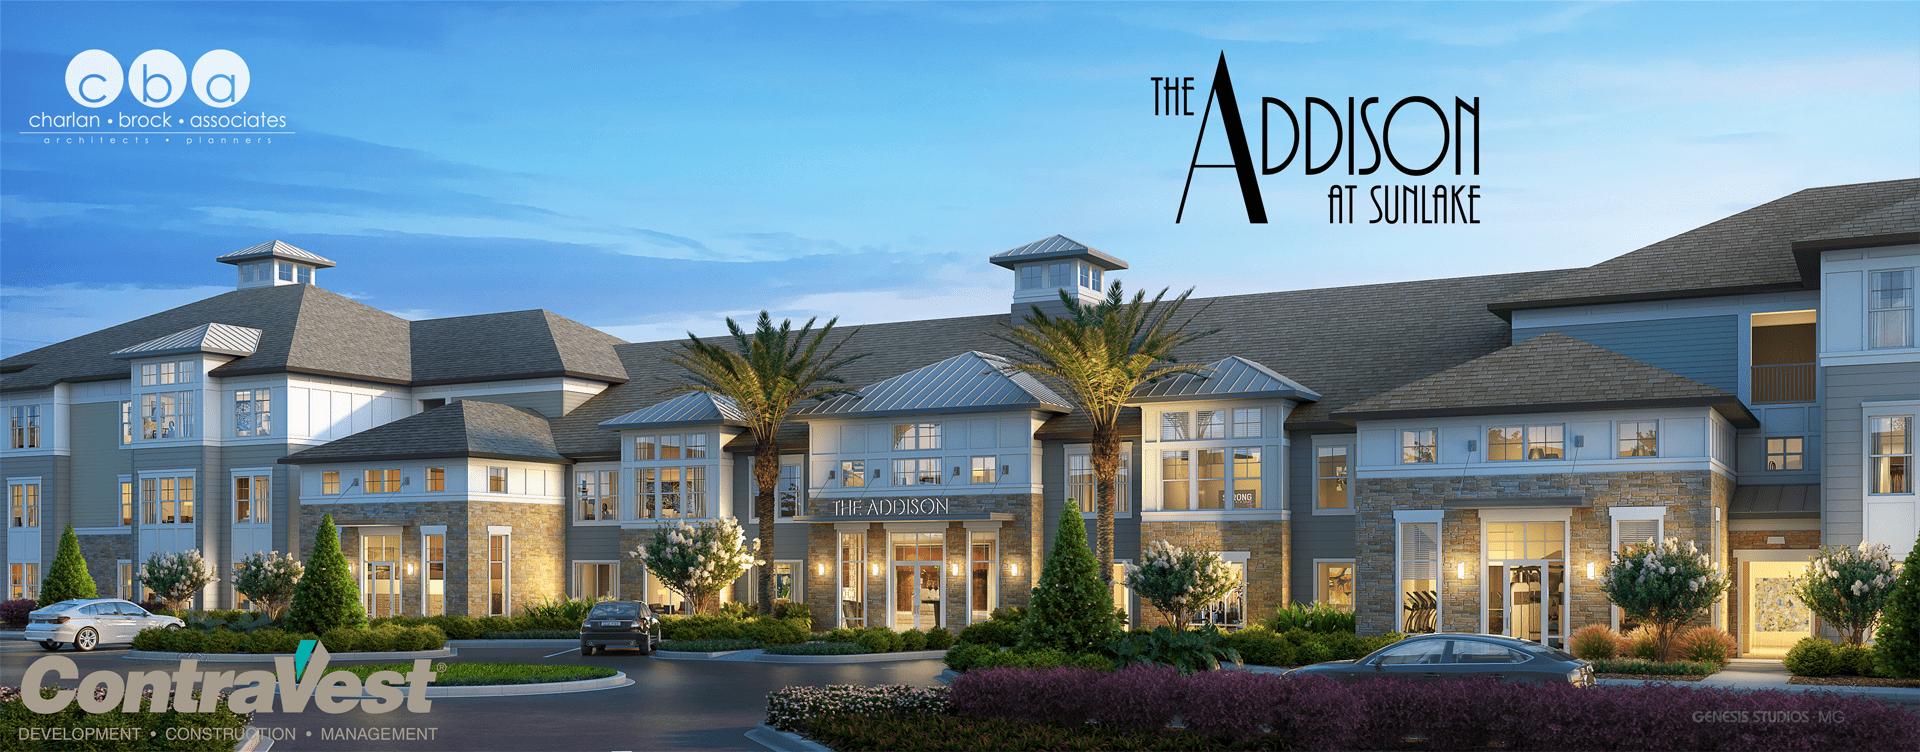 The Addison at Sunlake rendering